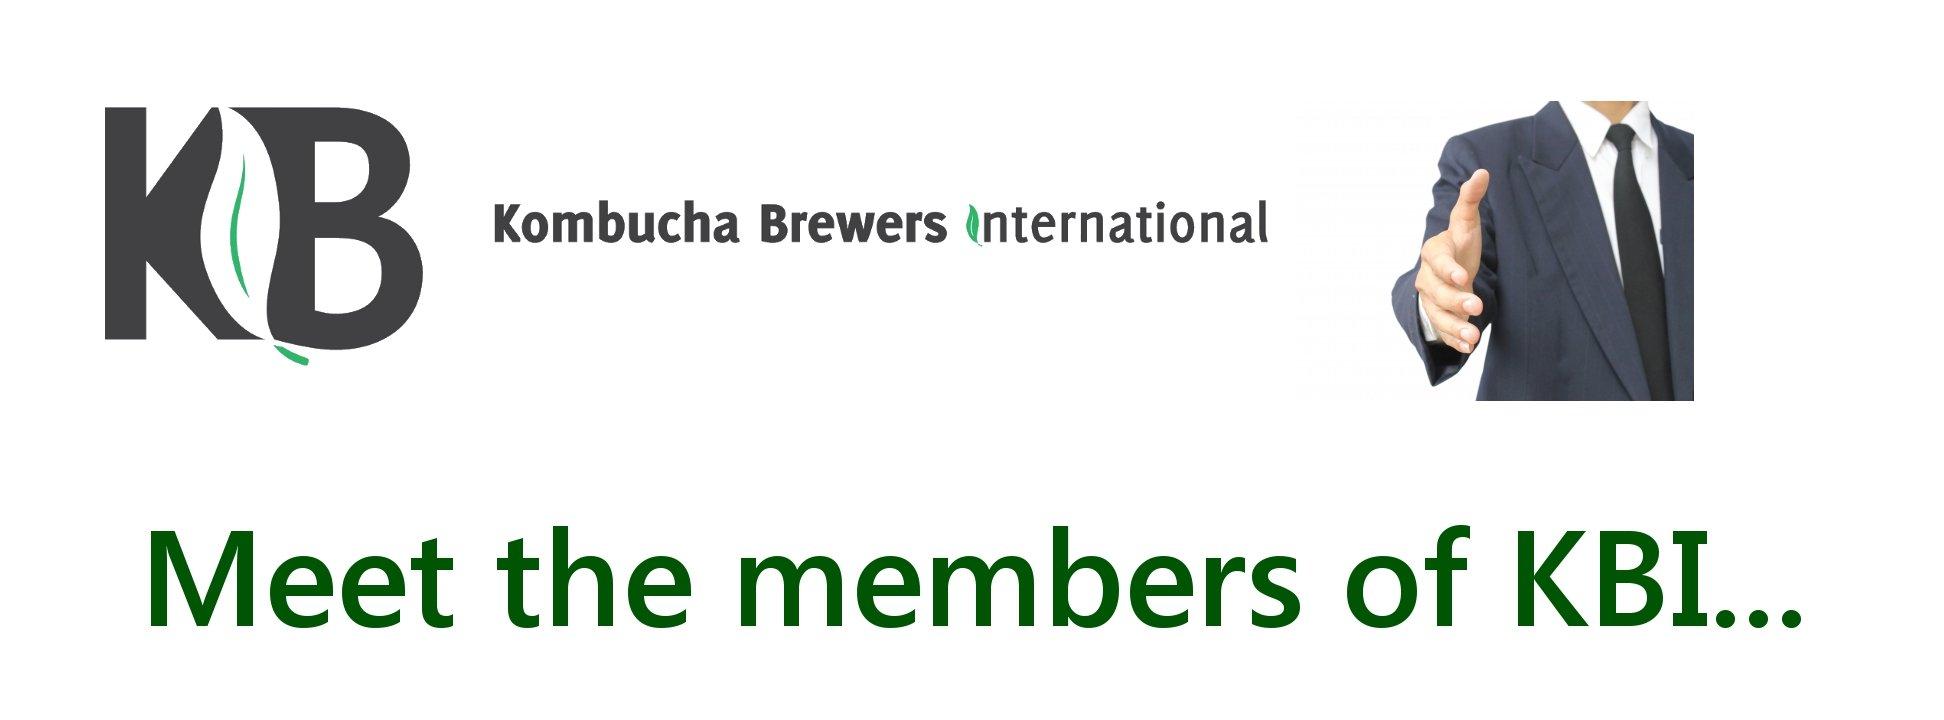 Meet-Our-Members-banner